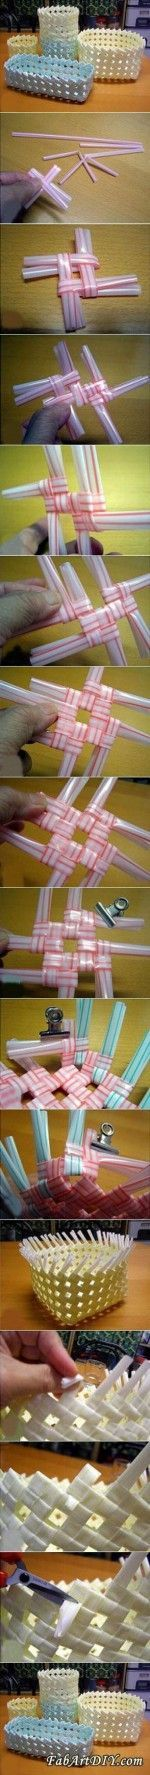 DIY Drinking Straw Basket